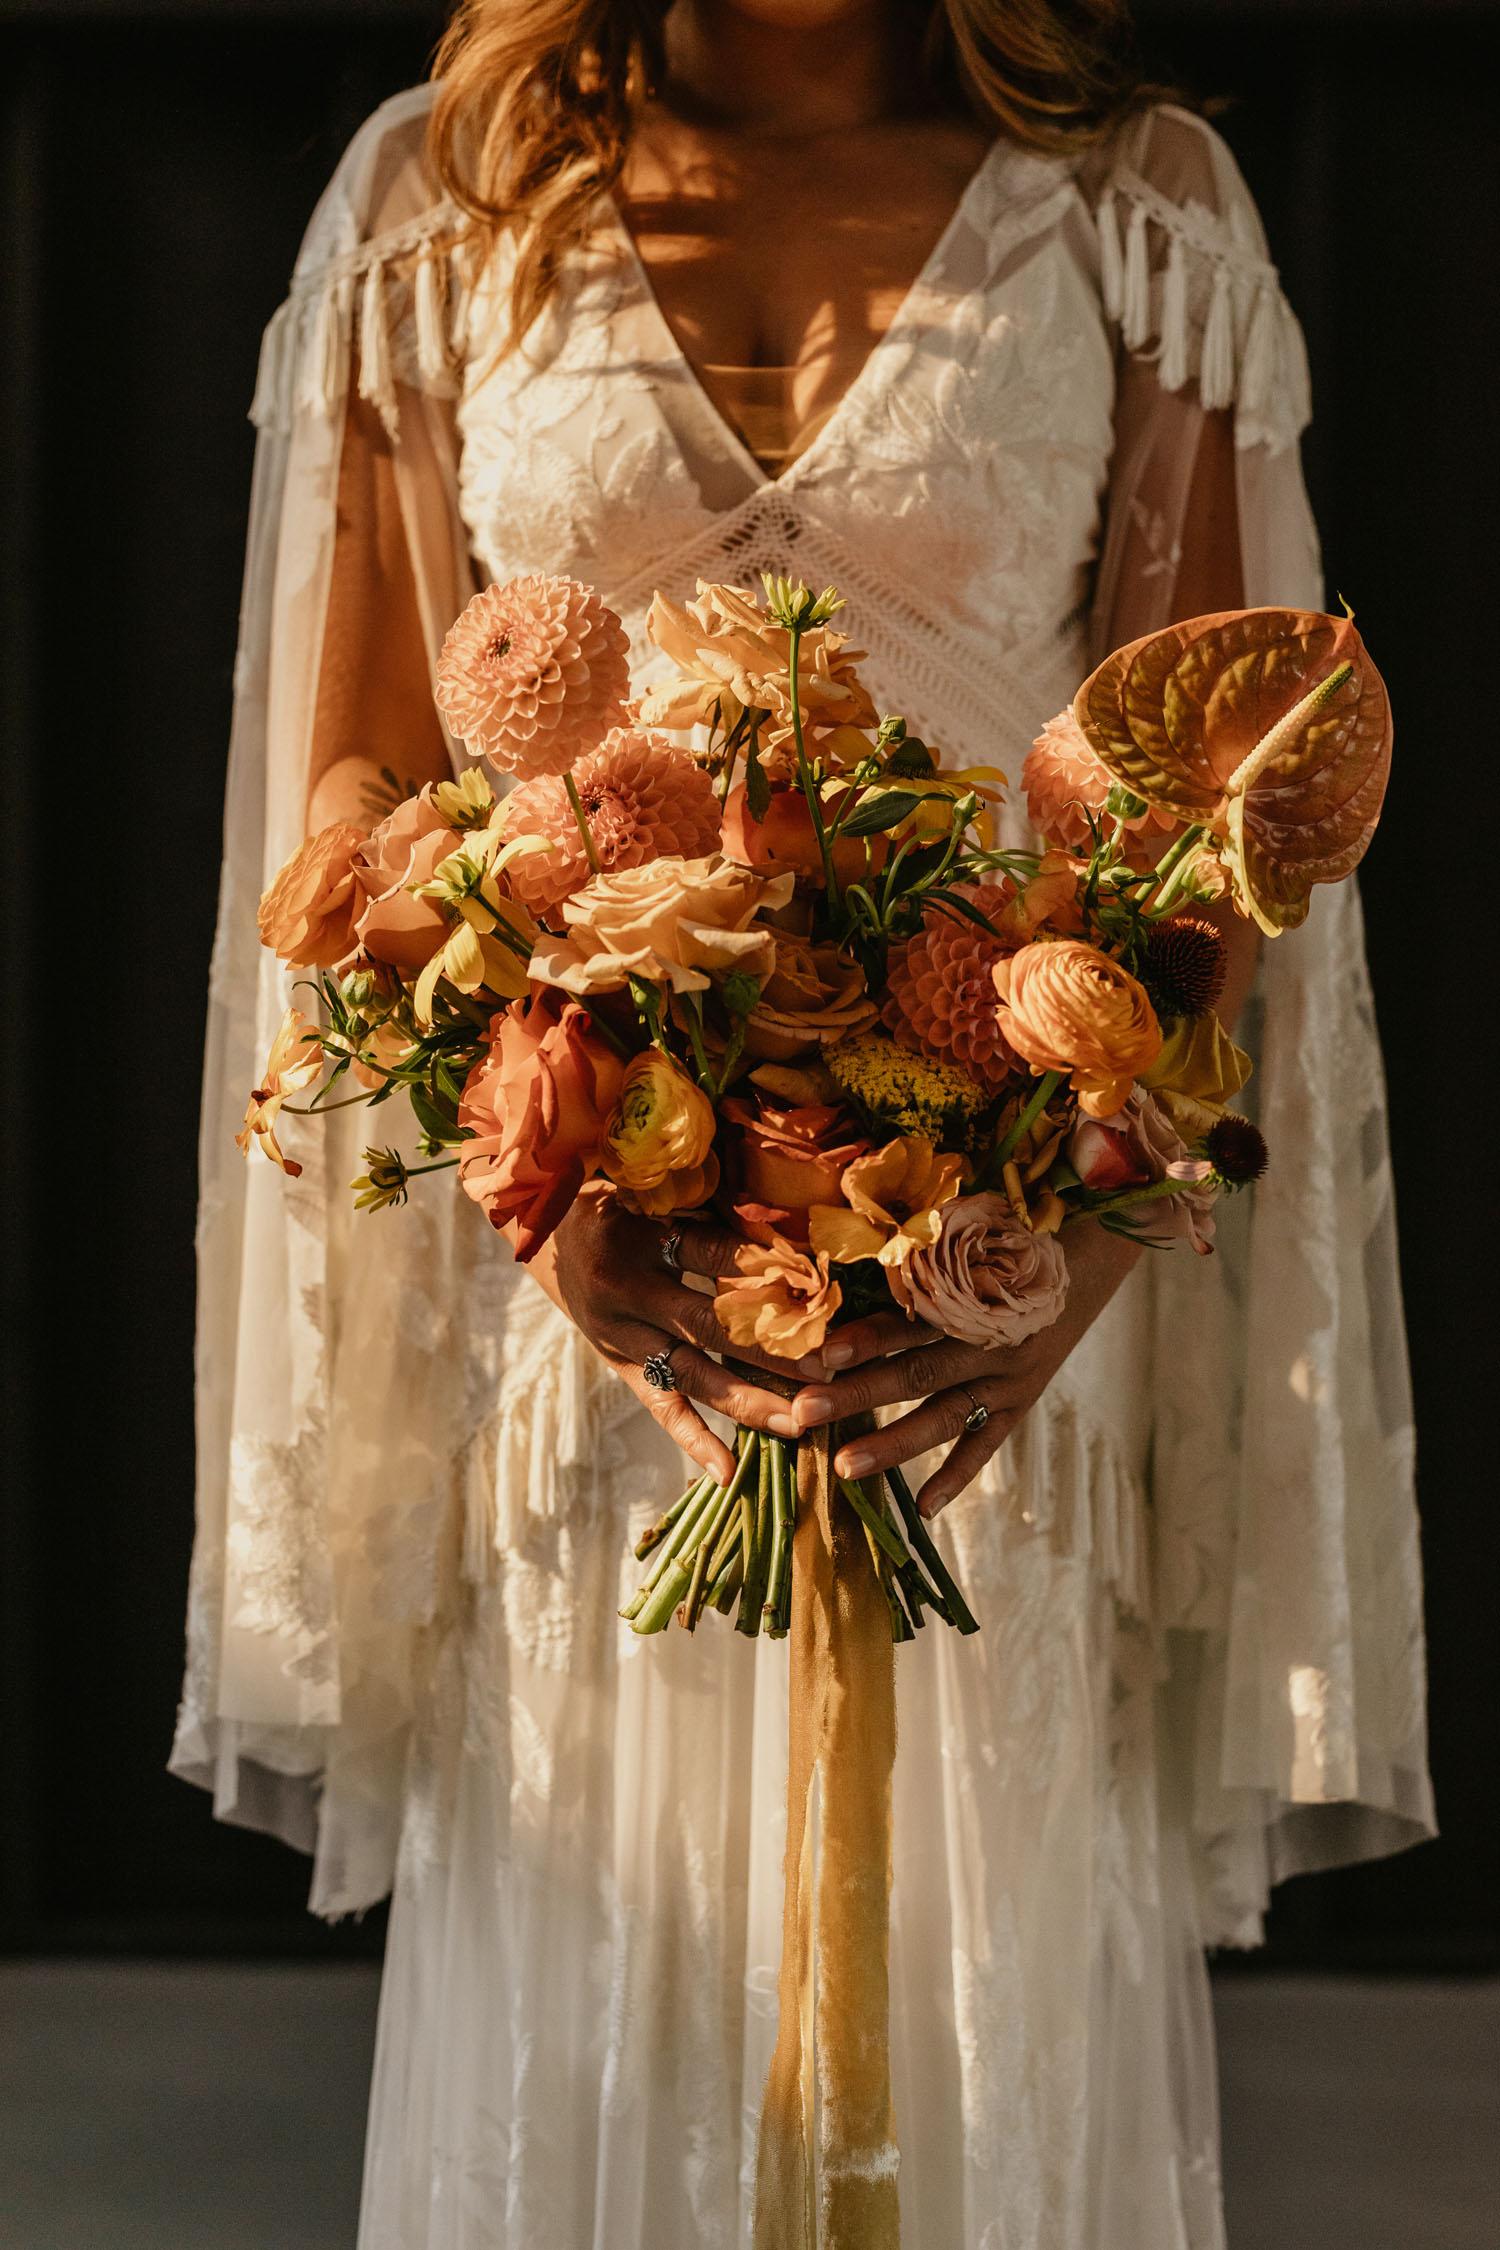 Bohemian bruid met trouwjurk met korte mouwen